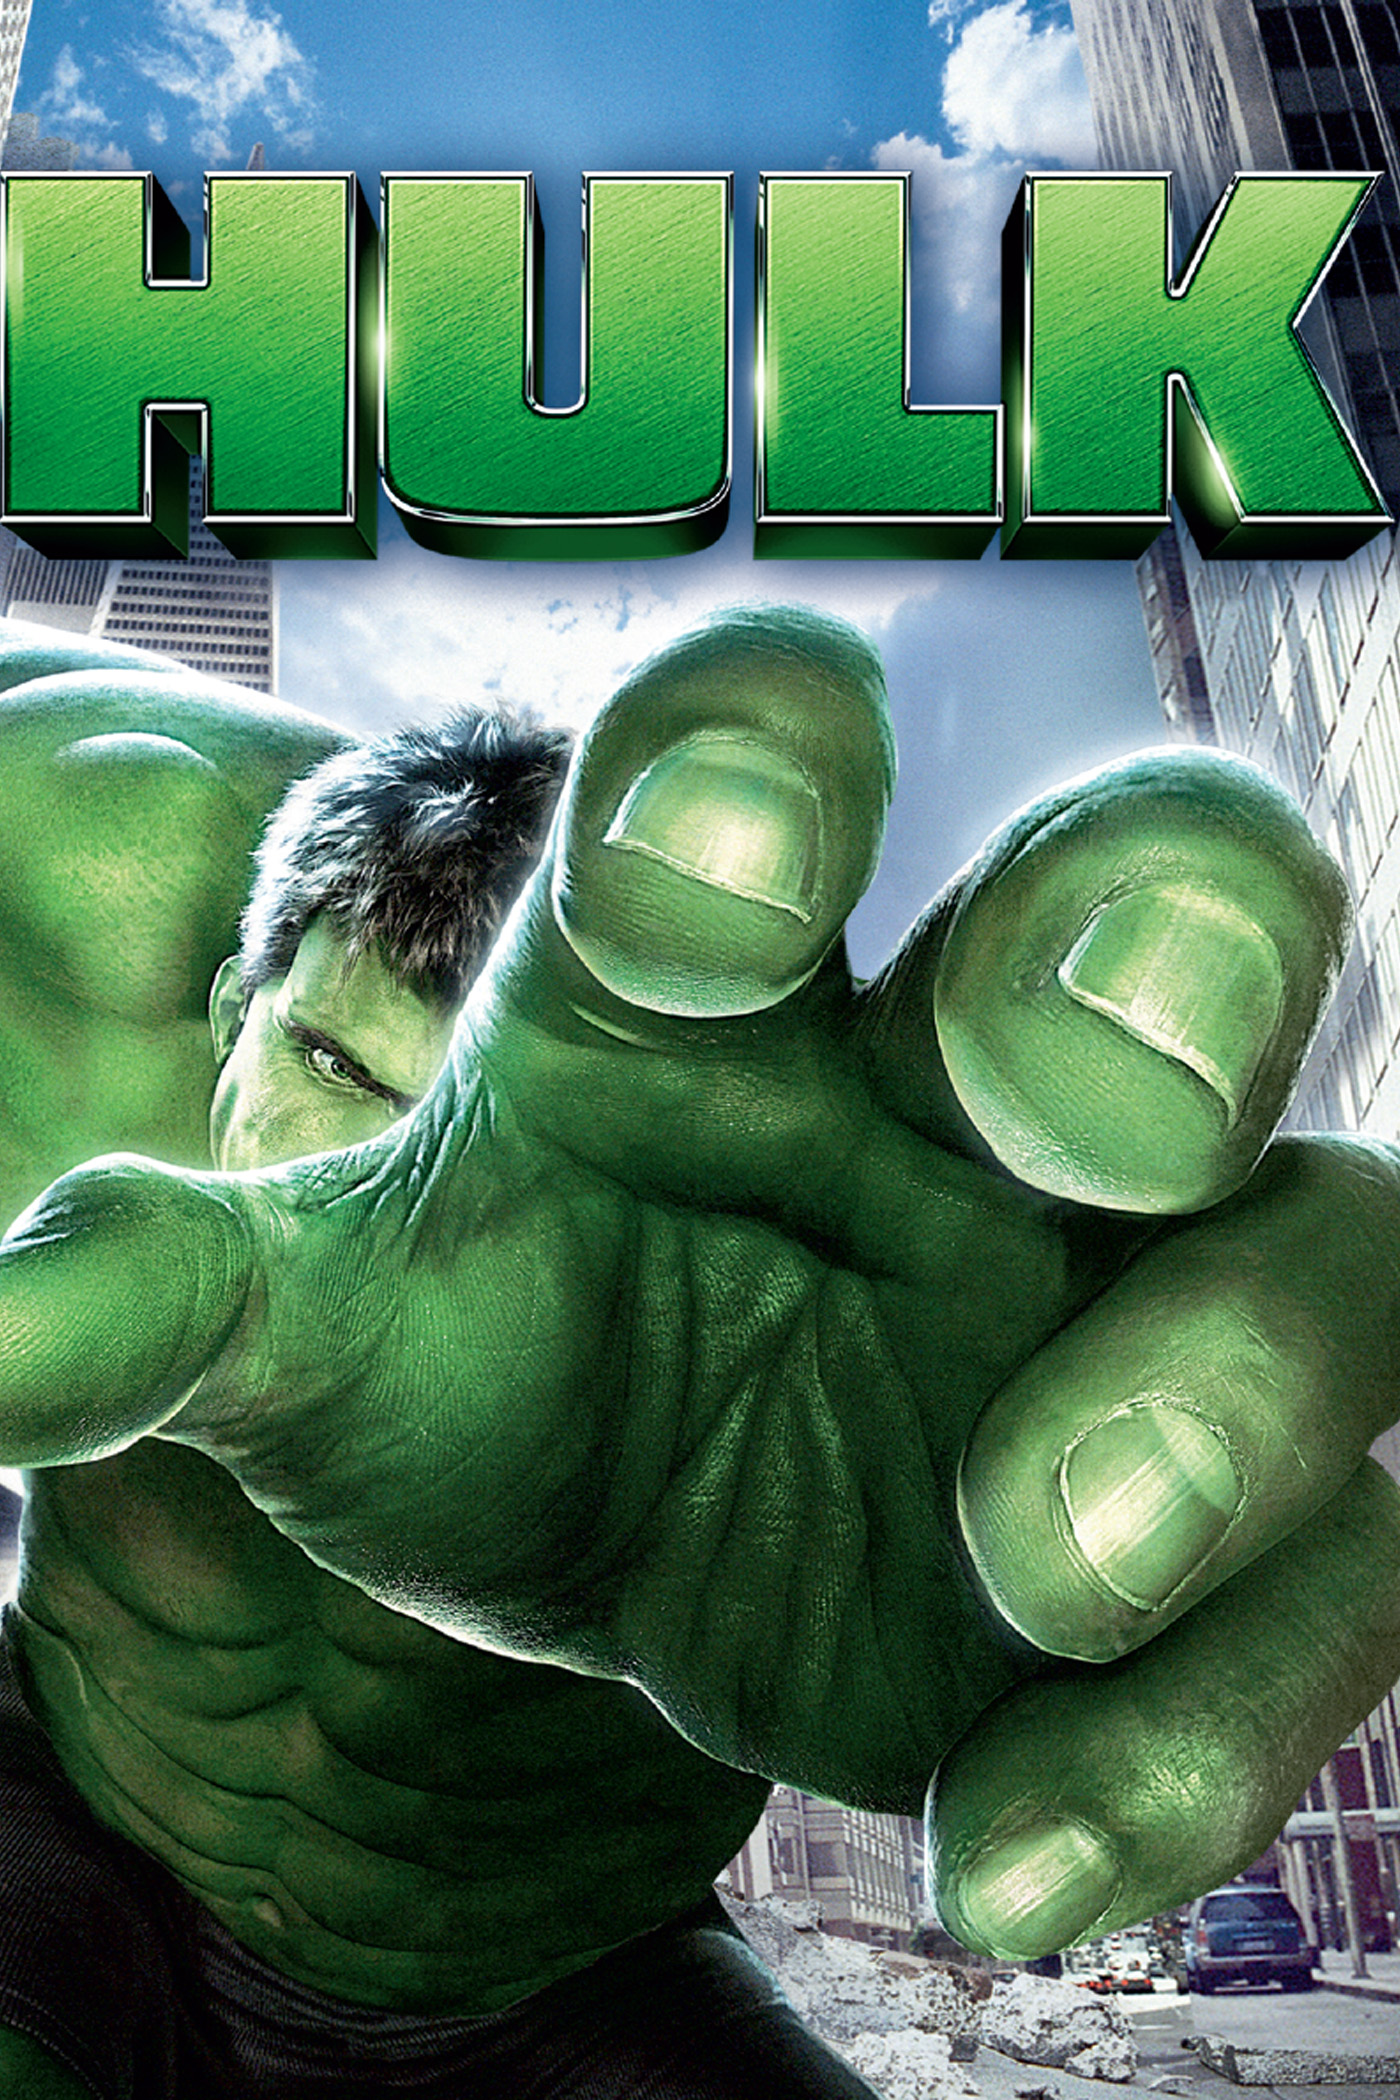 Hulk wants you!